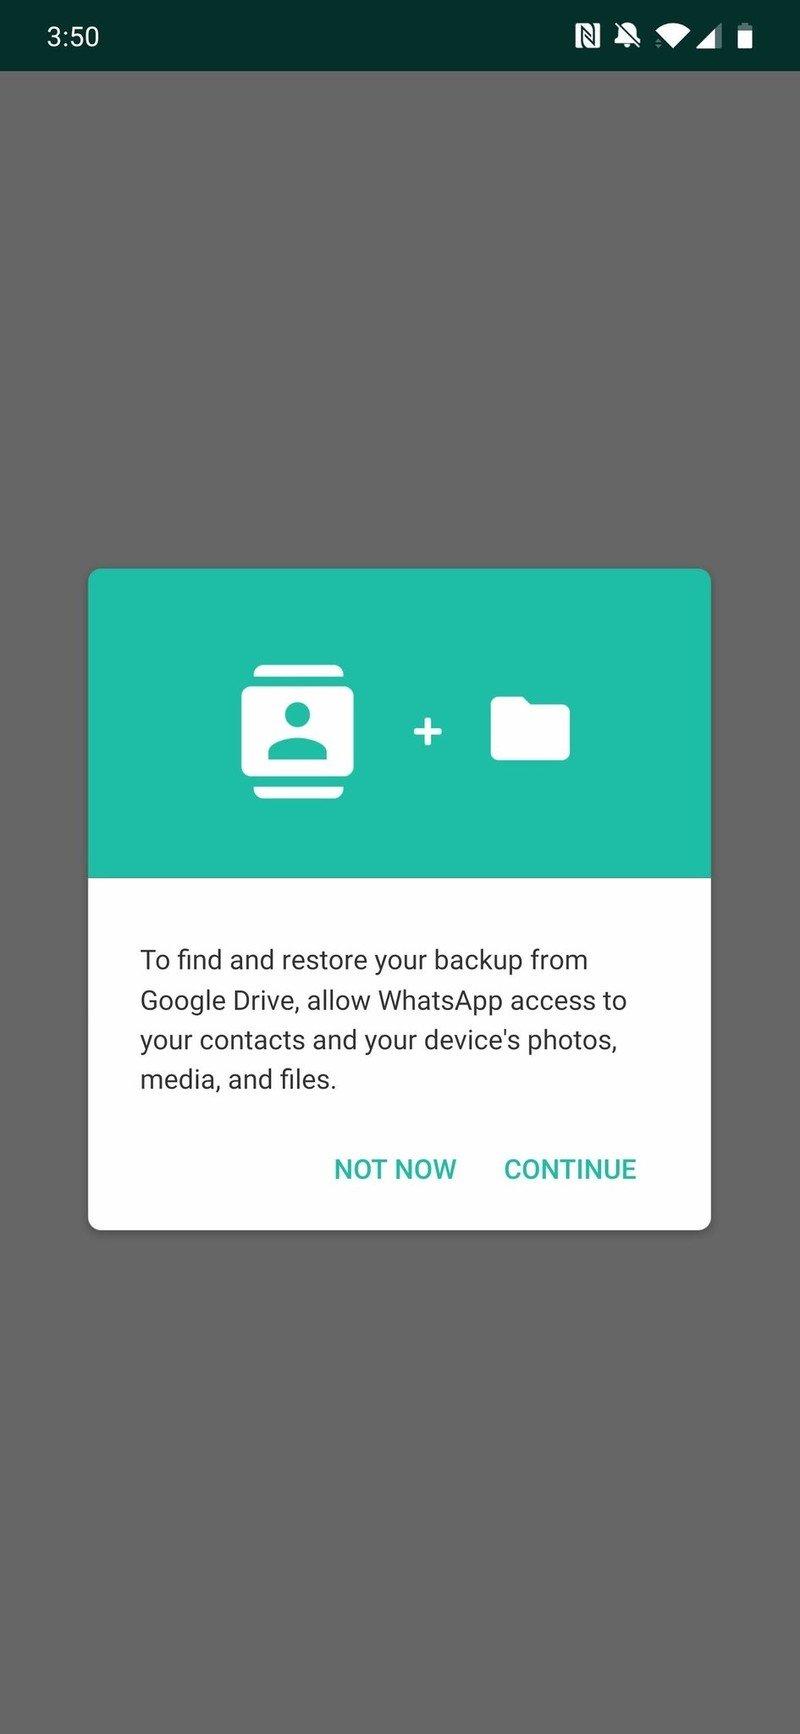 whatsapp-backup-messages-4.jpg?itok=z-gG